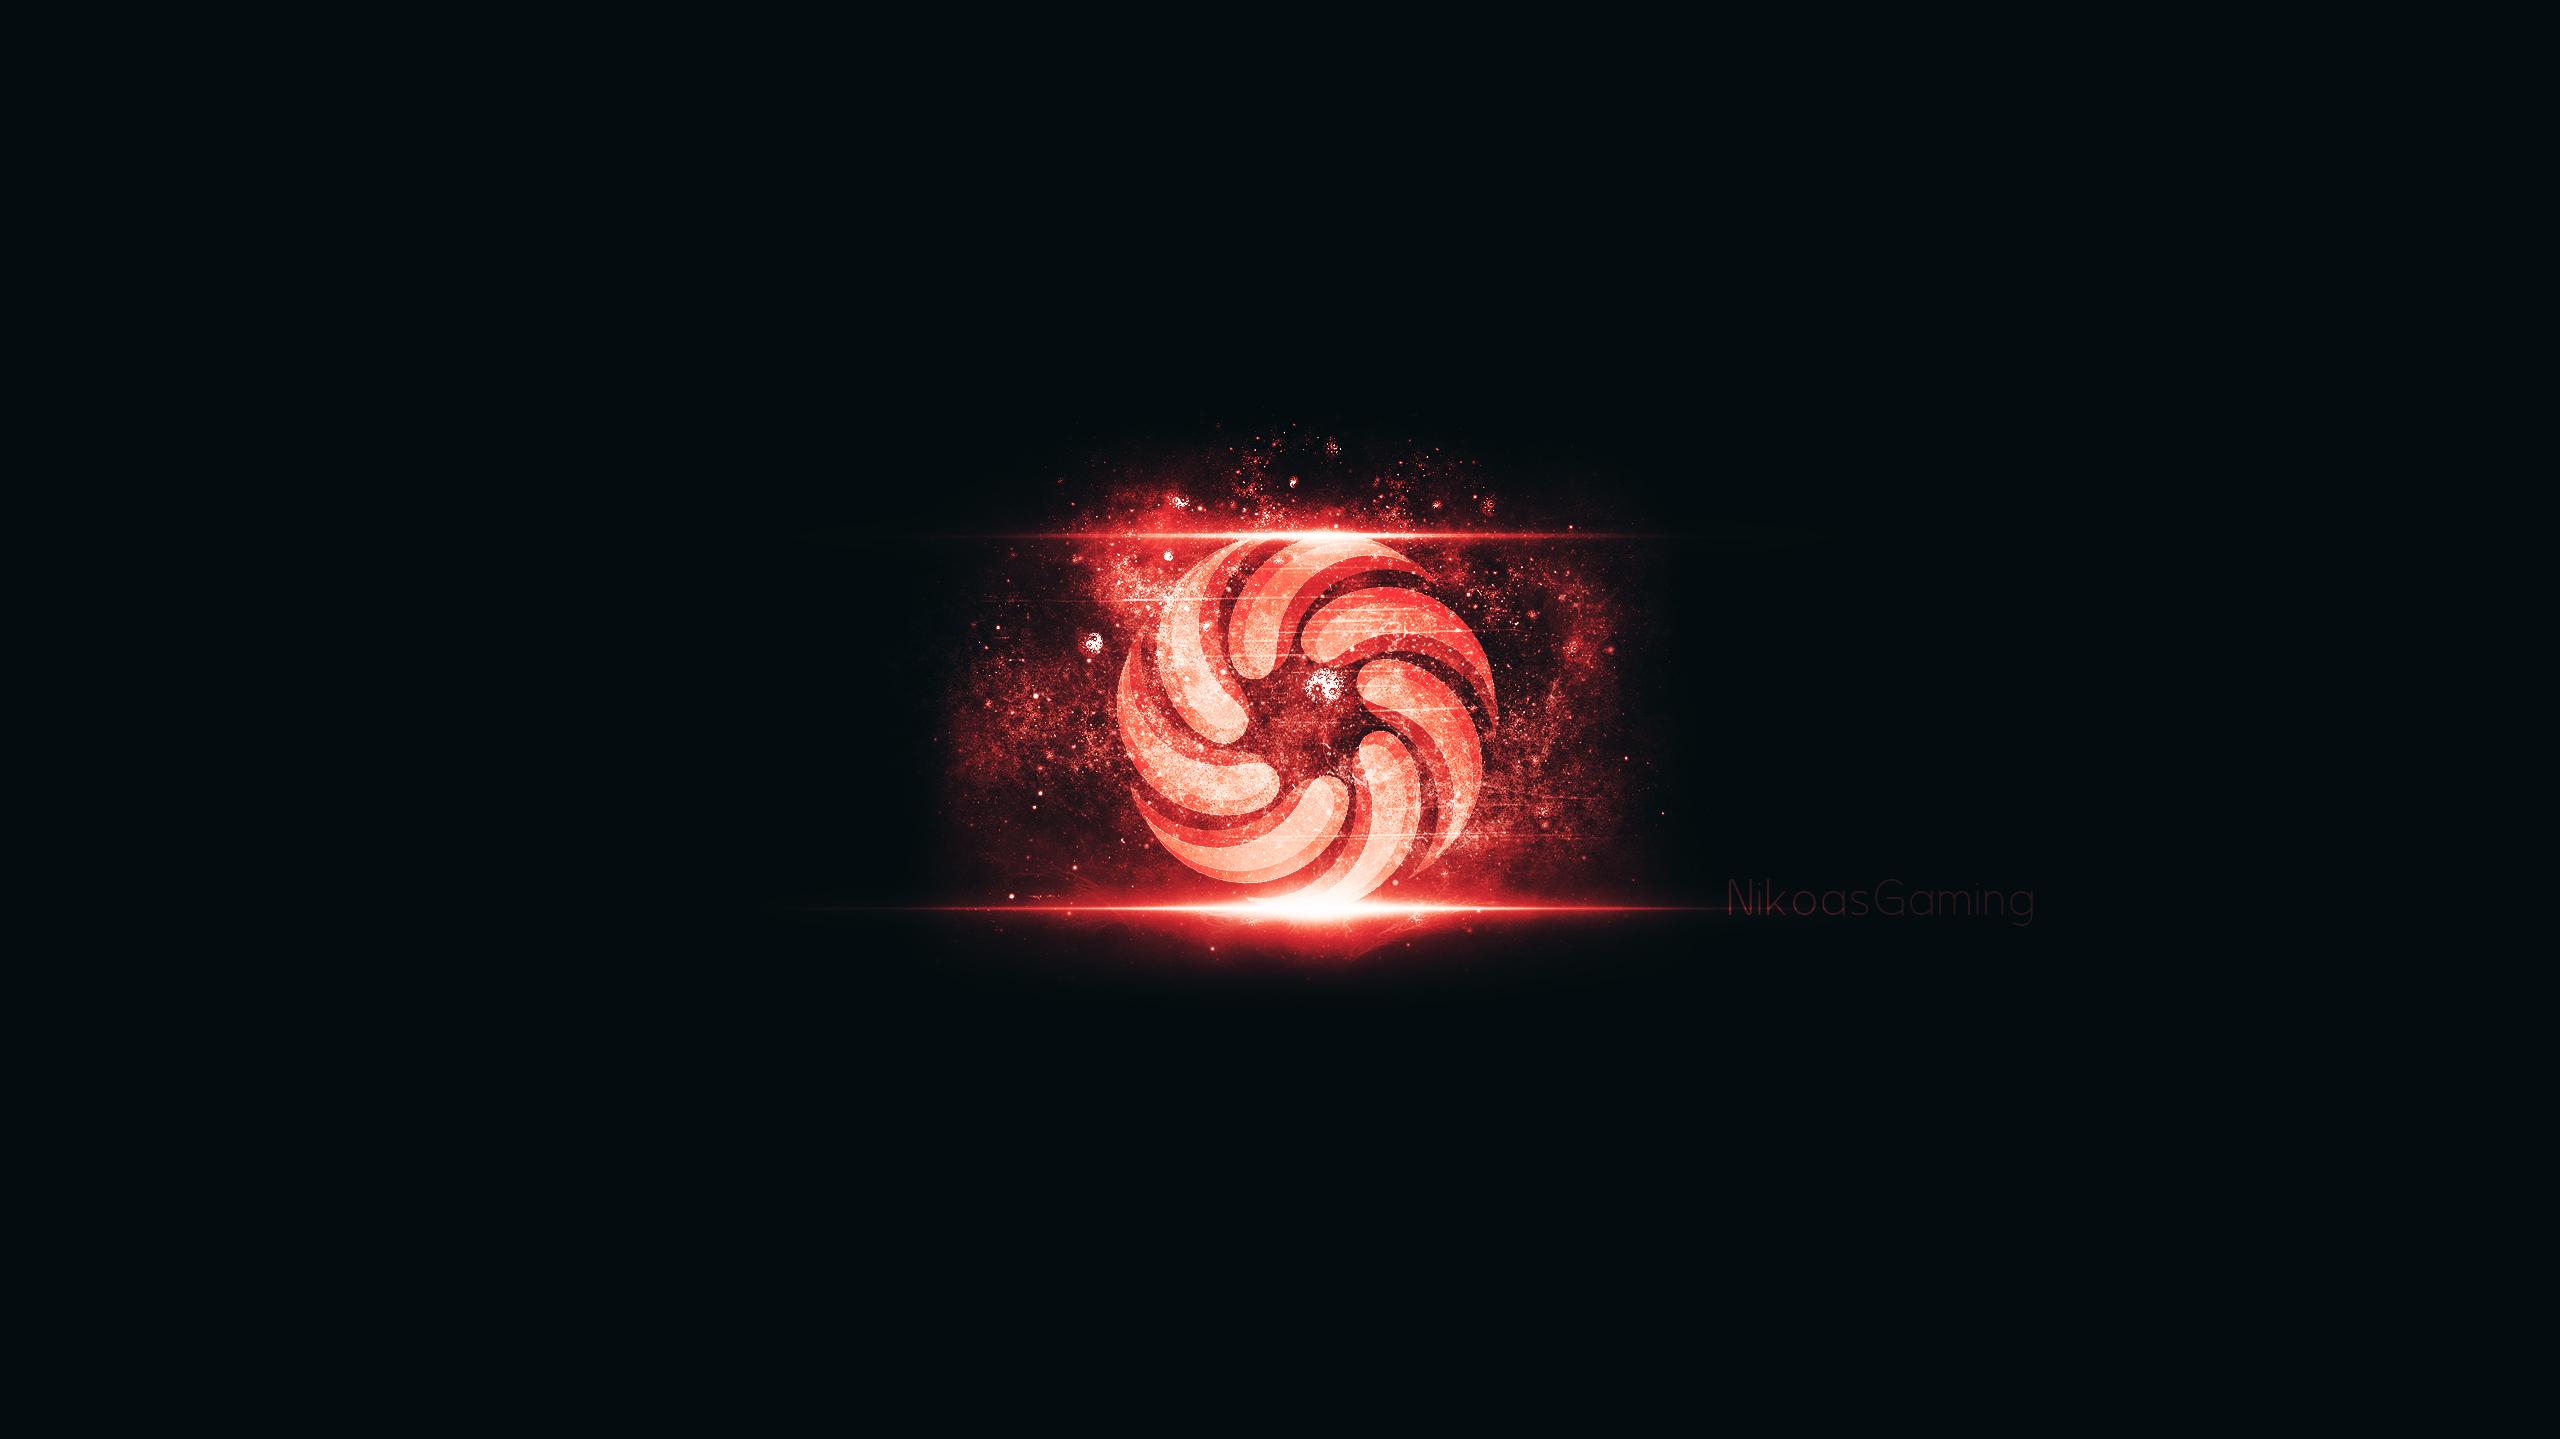 youtube background by macedoniangamer98 on deviantart